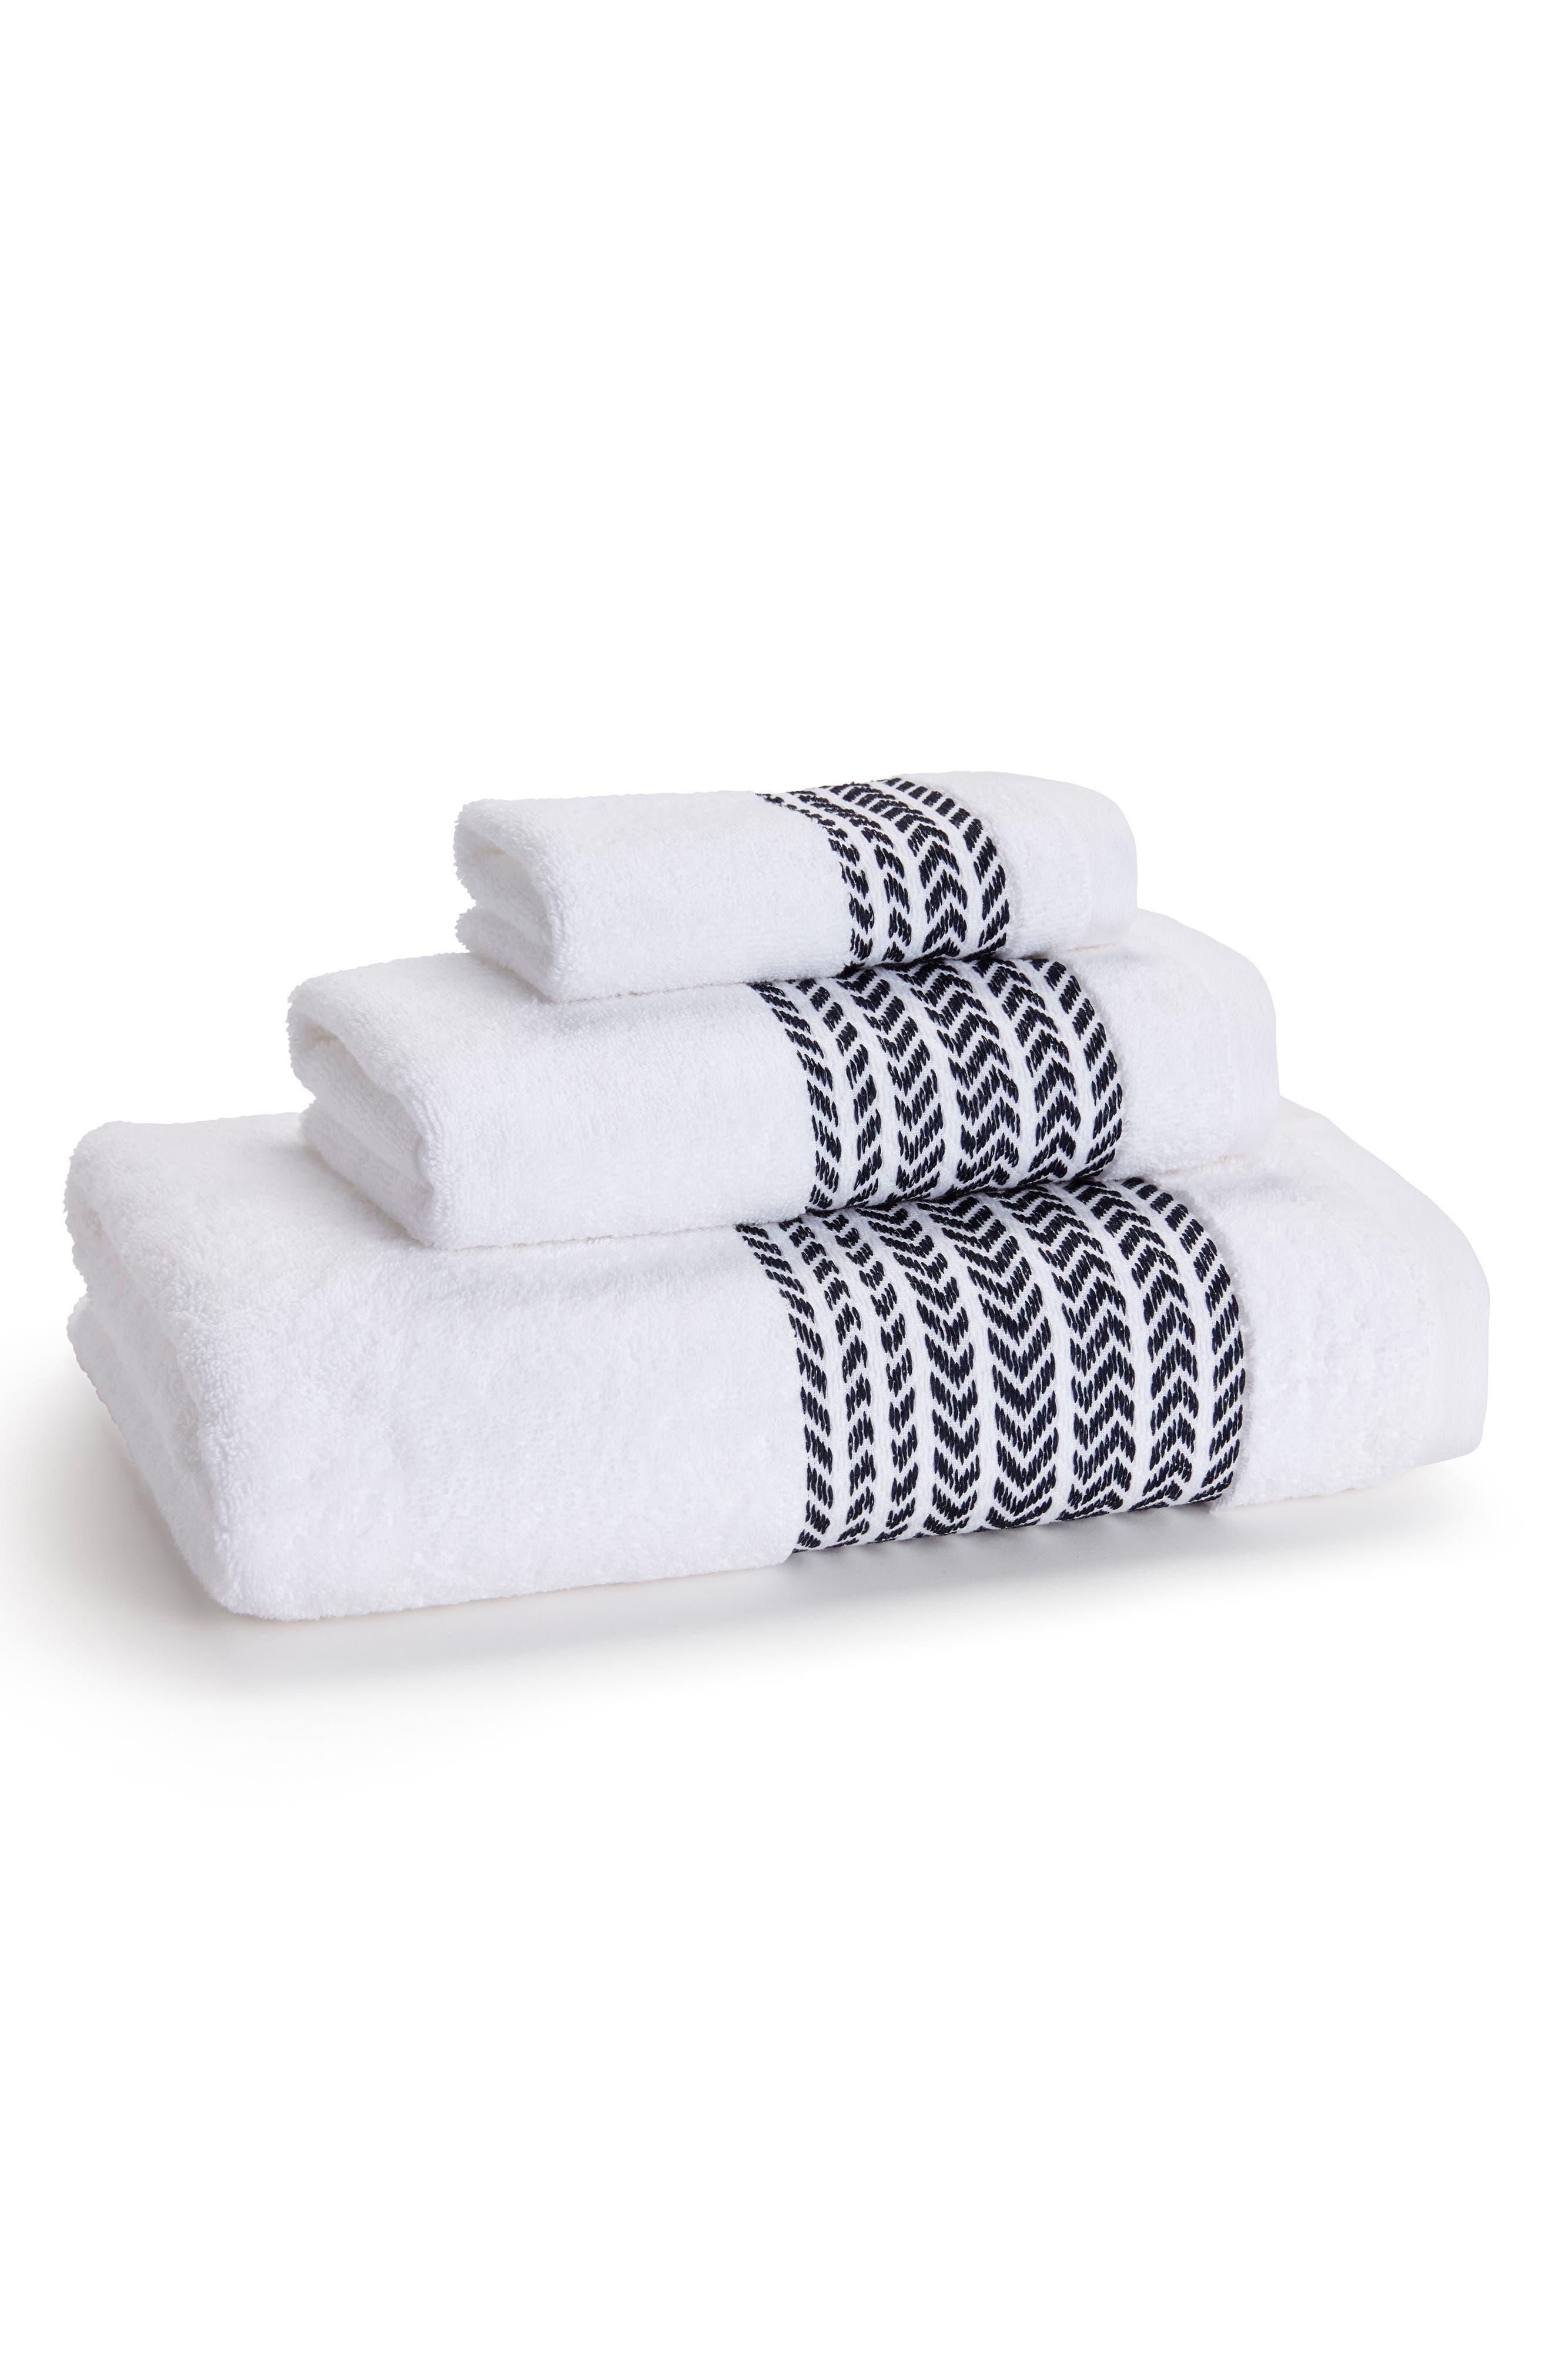 Alternate Image 1 Selected - KASSATEX Baja Bath Towel